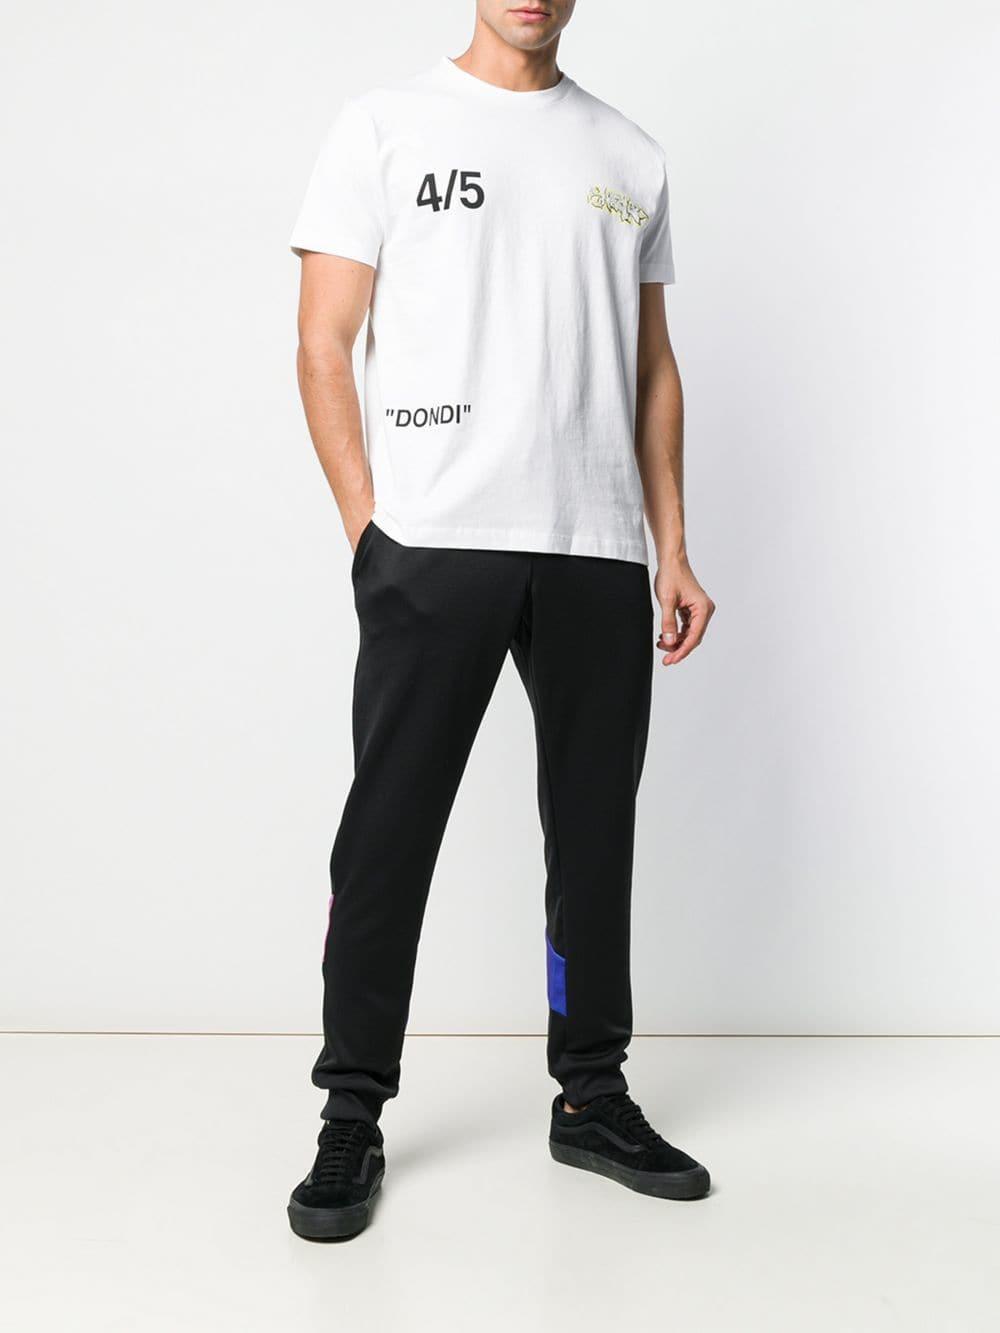 892a2e6b1ab5 Lyst - Off-White c o Virgil Abloh Short-sleeve Printed T-shirt in White for  Men